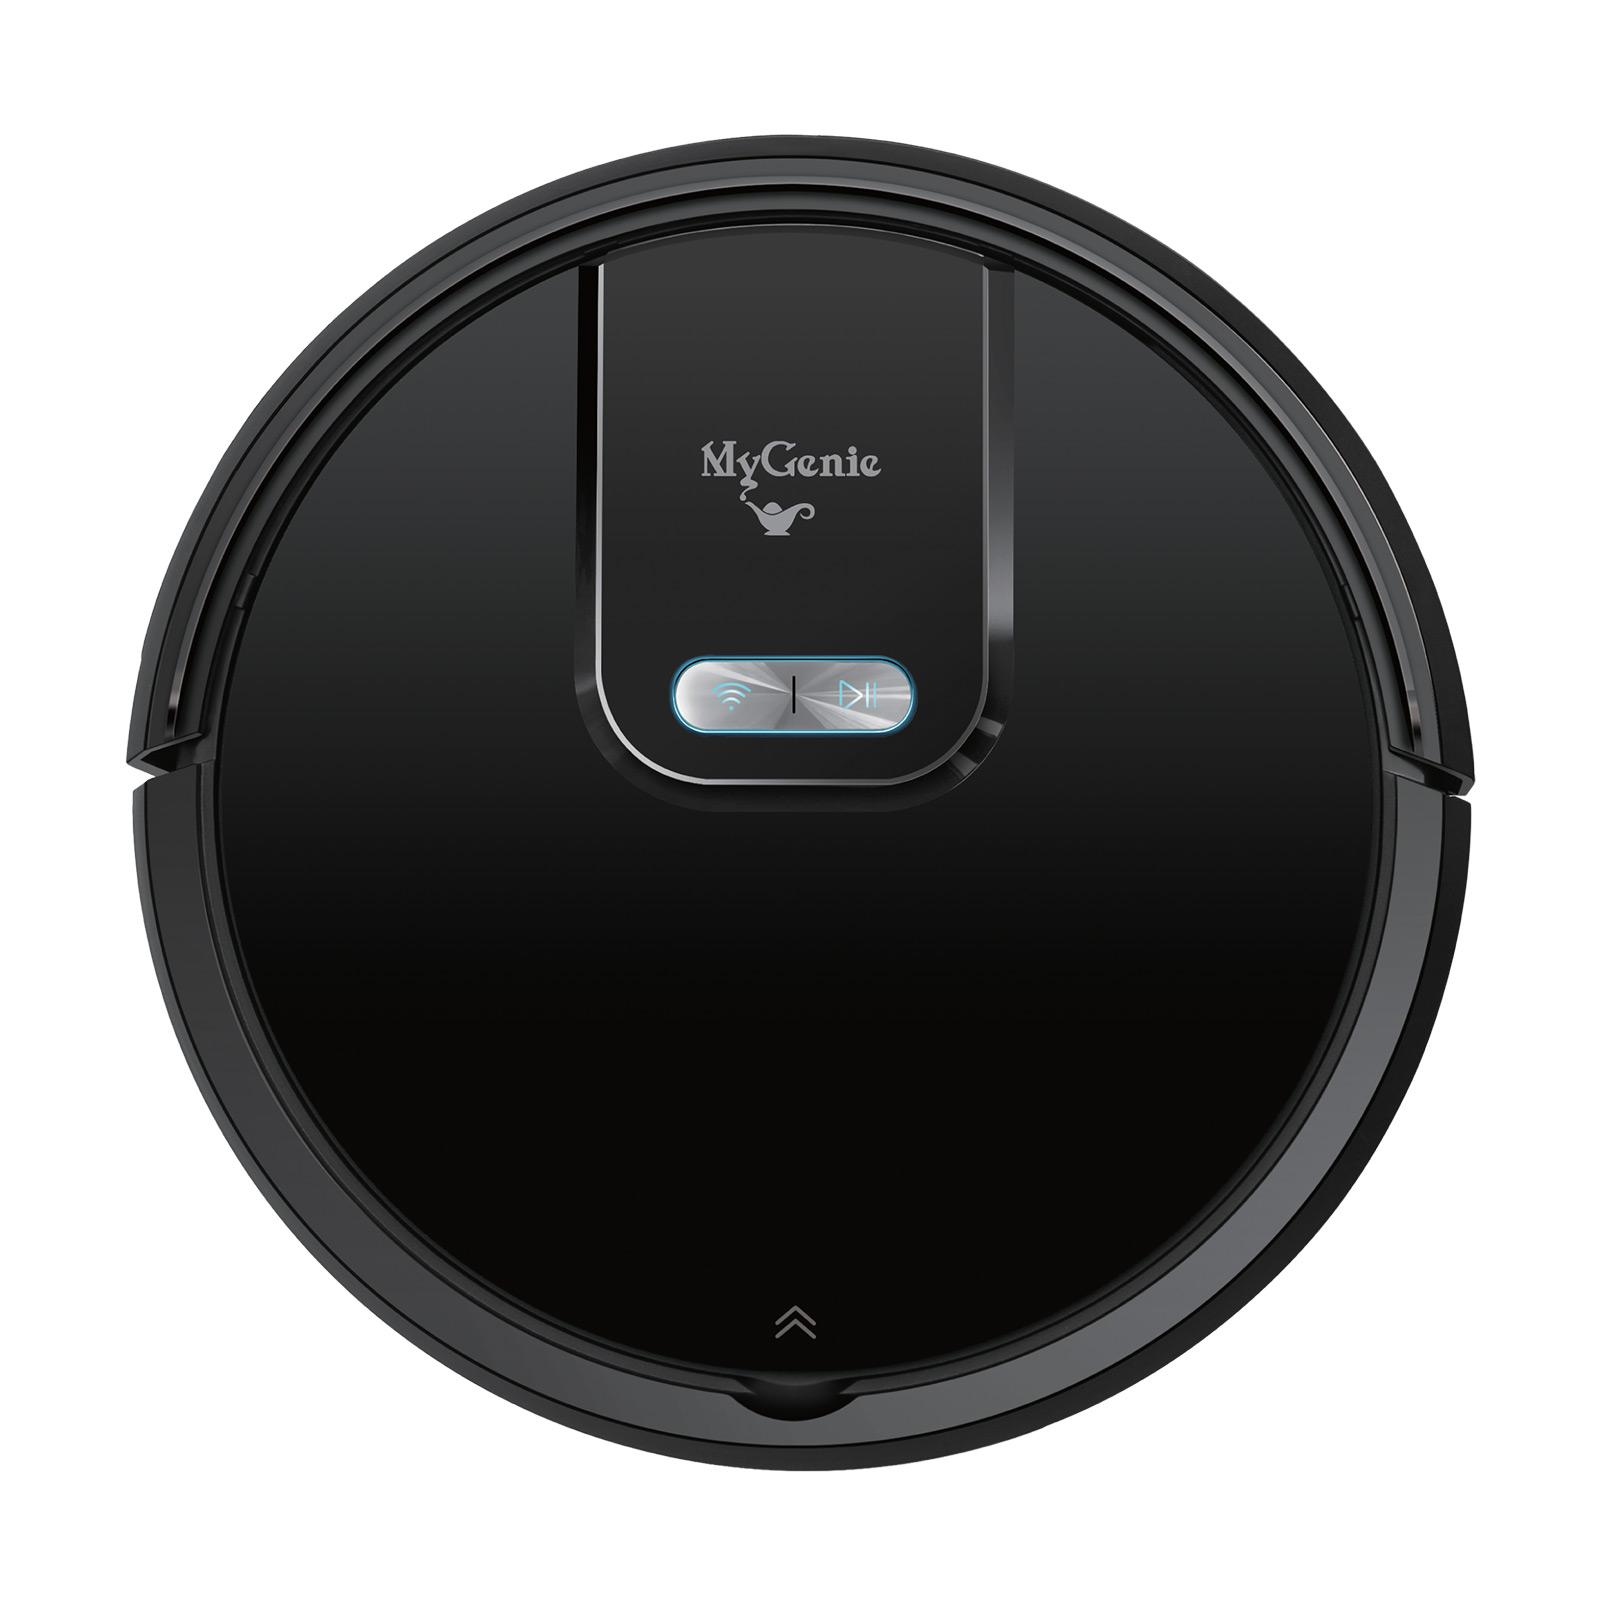 thumbnail 5 - MyGenie WI-FI GMAX Robotic Vacuum Cleaner Mop App Control Dry & Wet Auto Robot